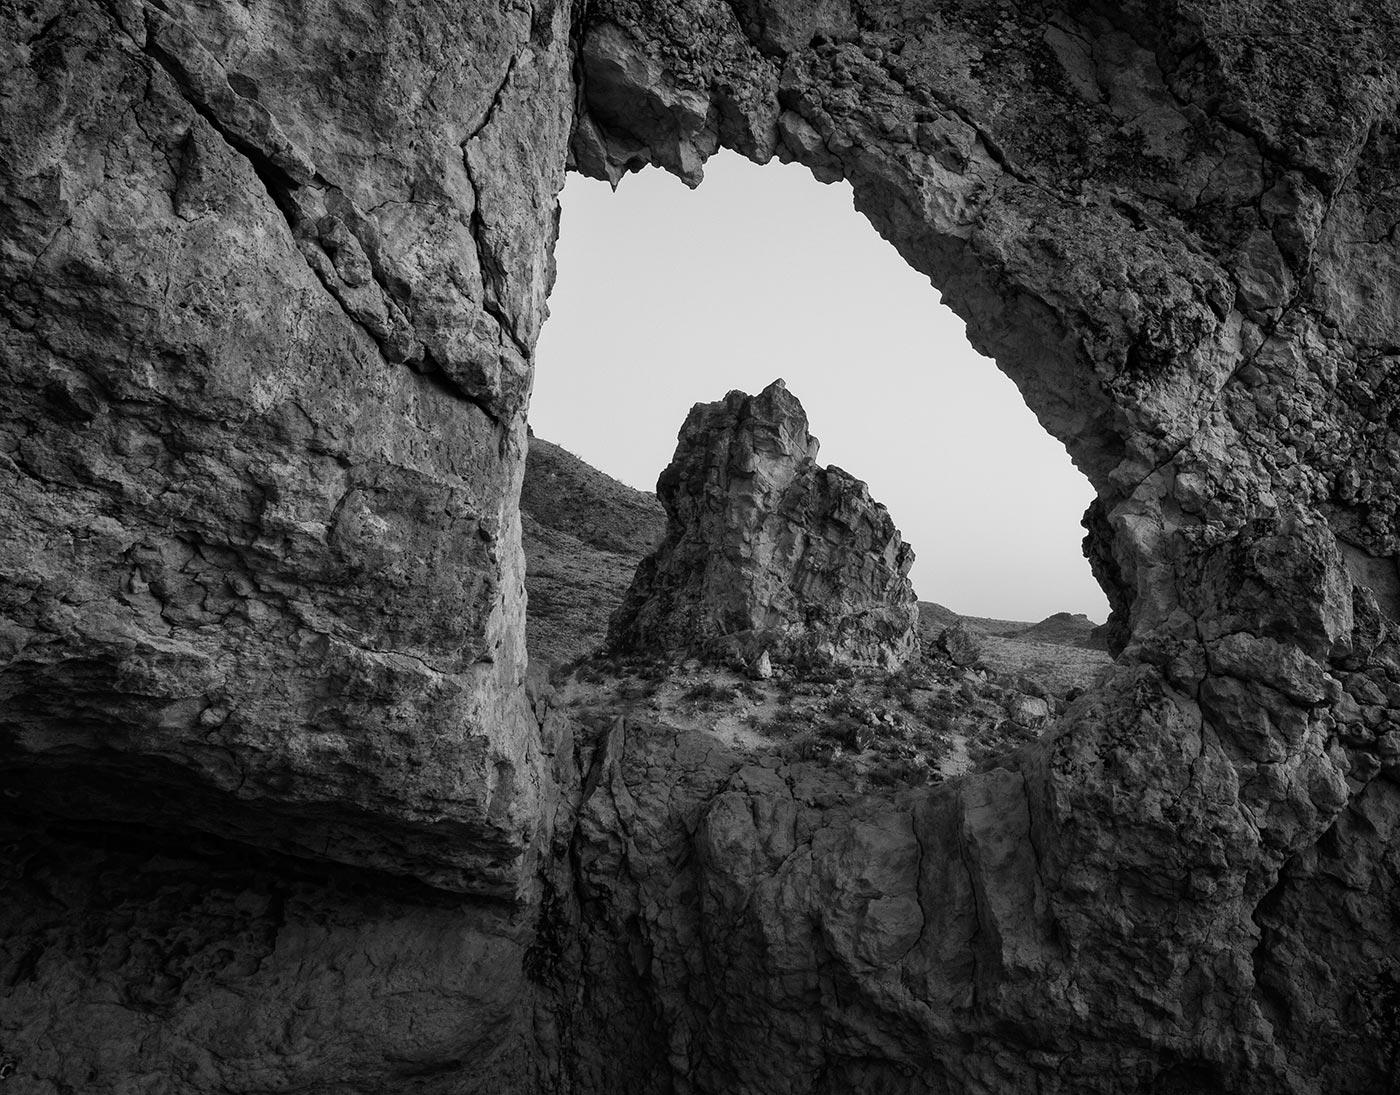 West-Texas-ABP-Big Bend National Park_Chimneys_Arch.jpg